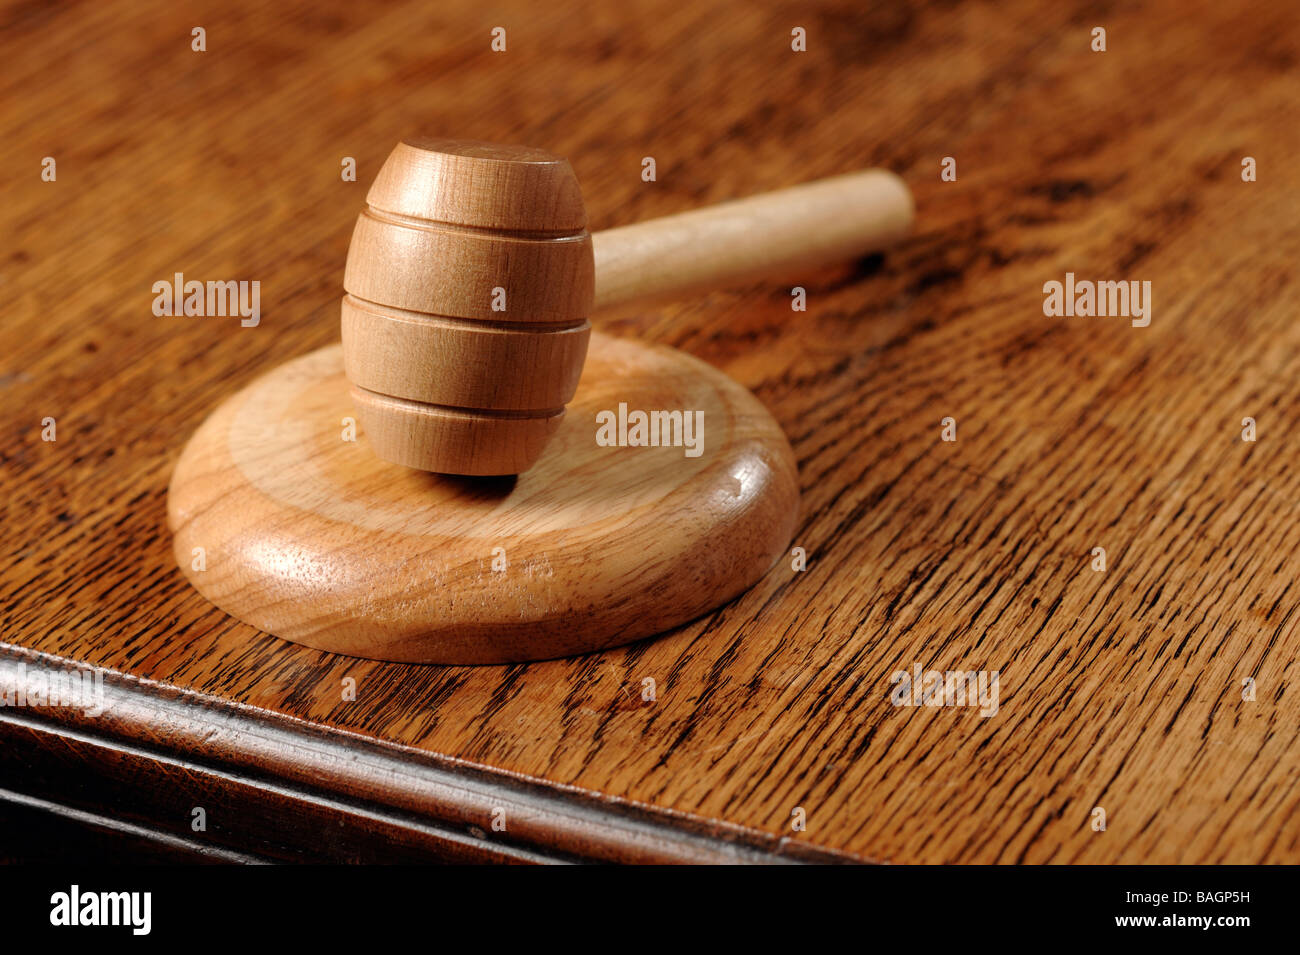 Auctioneer gavel hammer - Stock Image